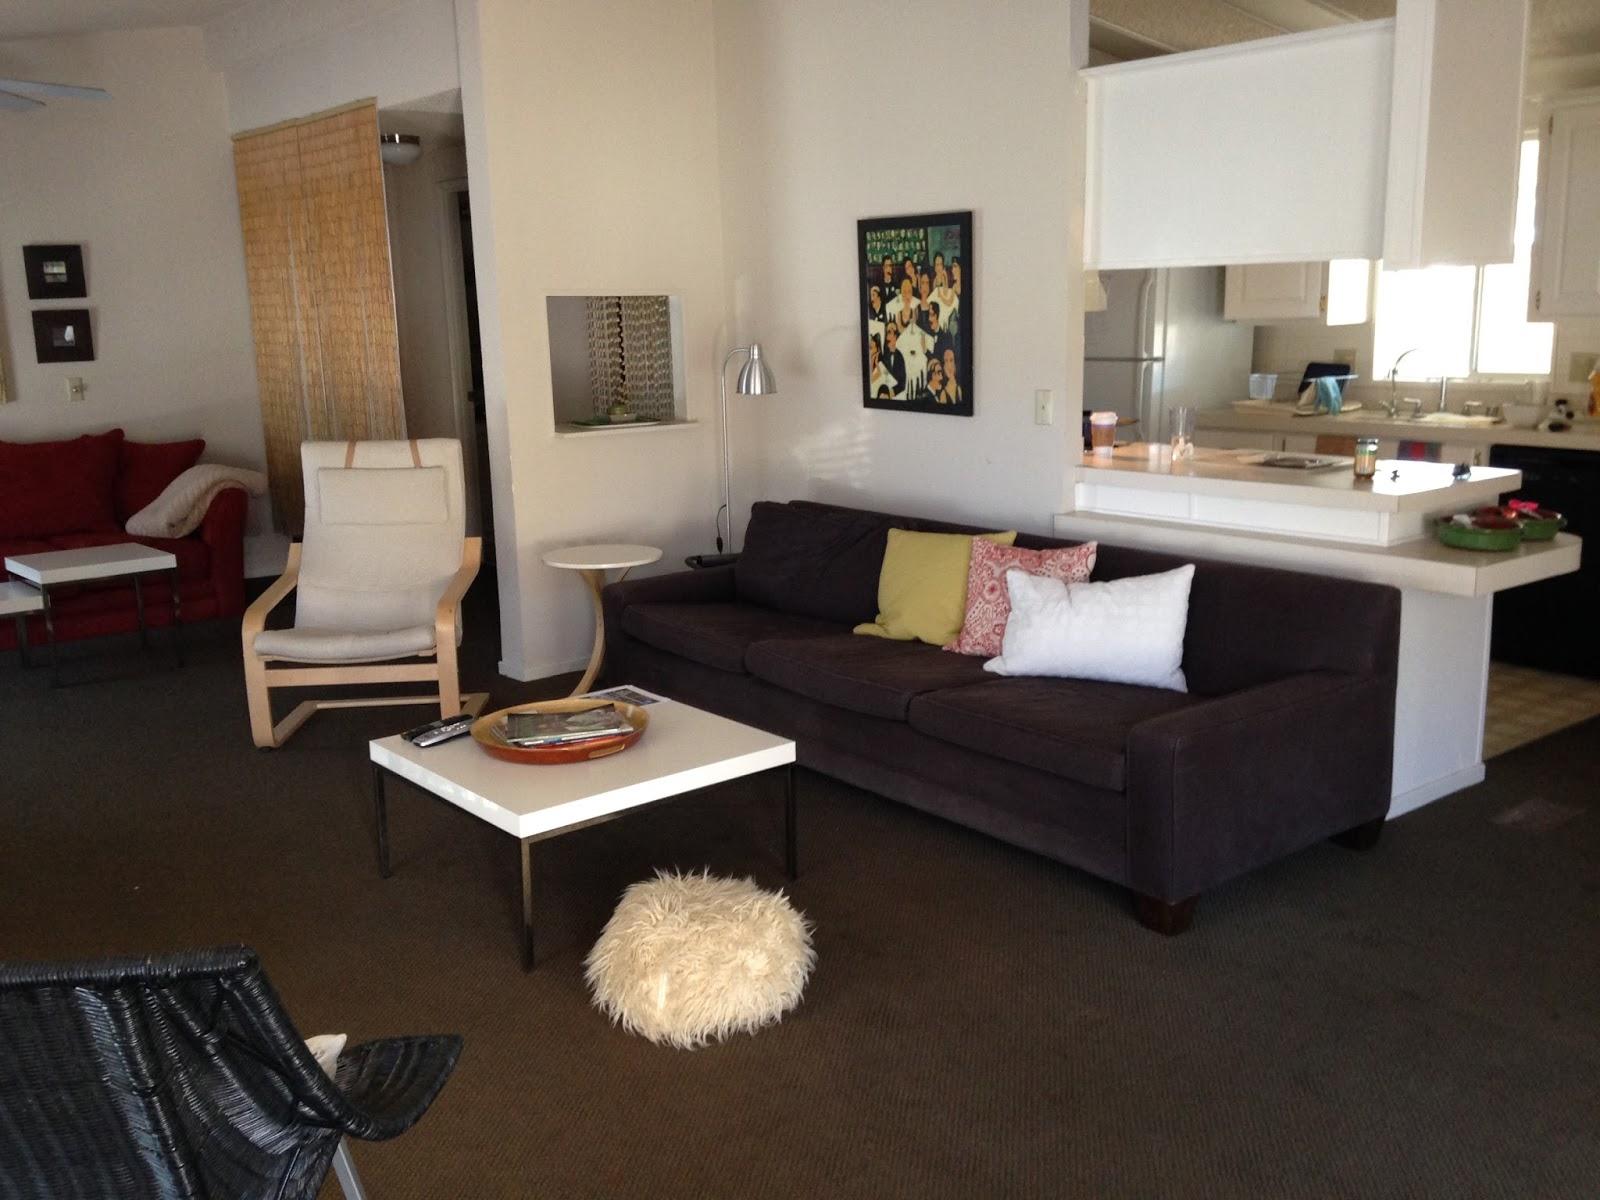 my mod mod mobile home our complete mobile home renovation. Black Bedroom Furniture Sets. Home Design Ideas